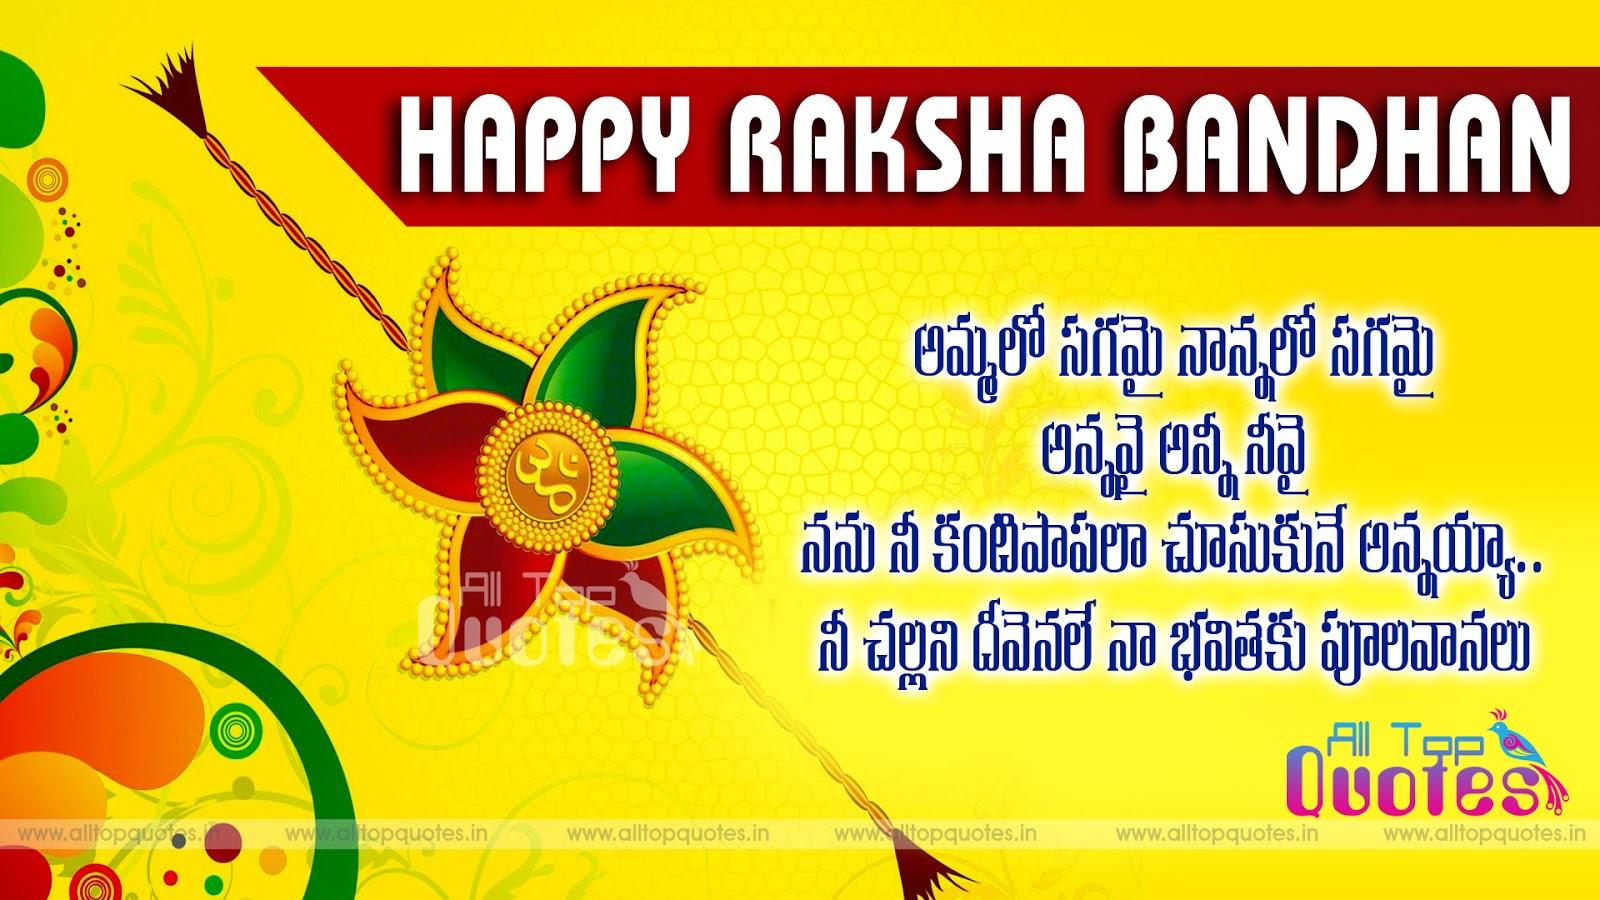 Happy Raksha Bandhan Greetings Cards & Ecards in Marathi & Telugu